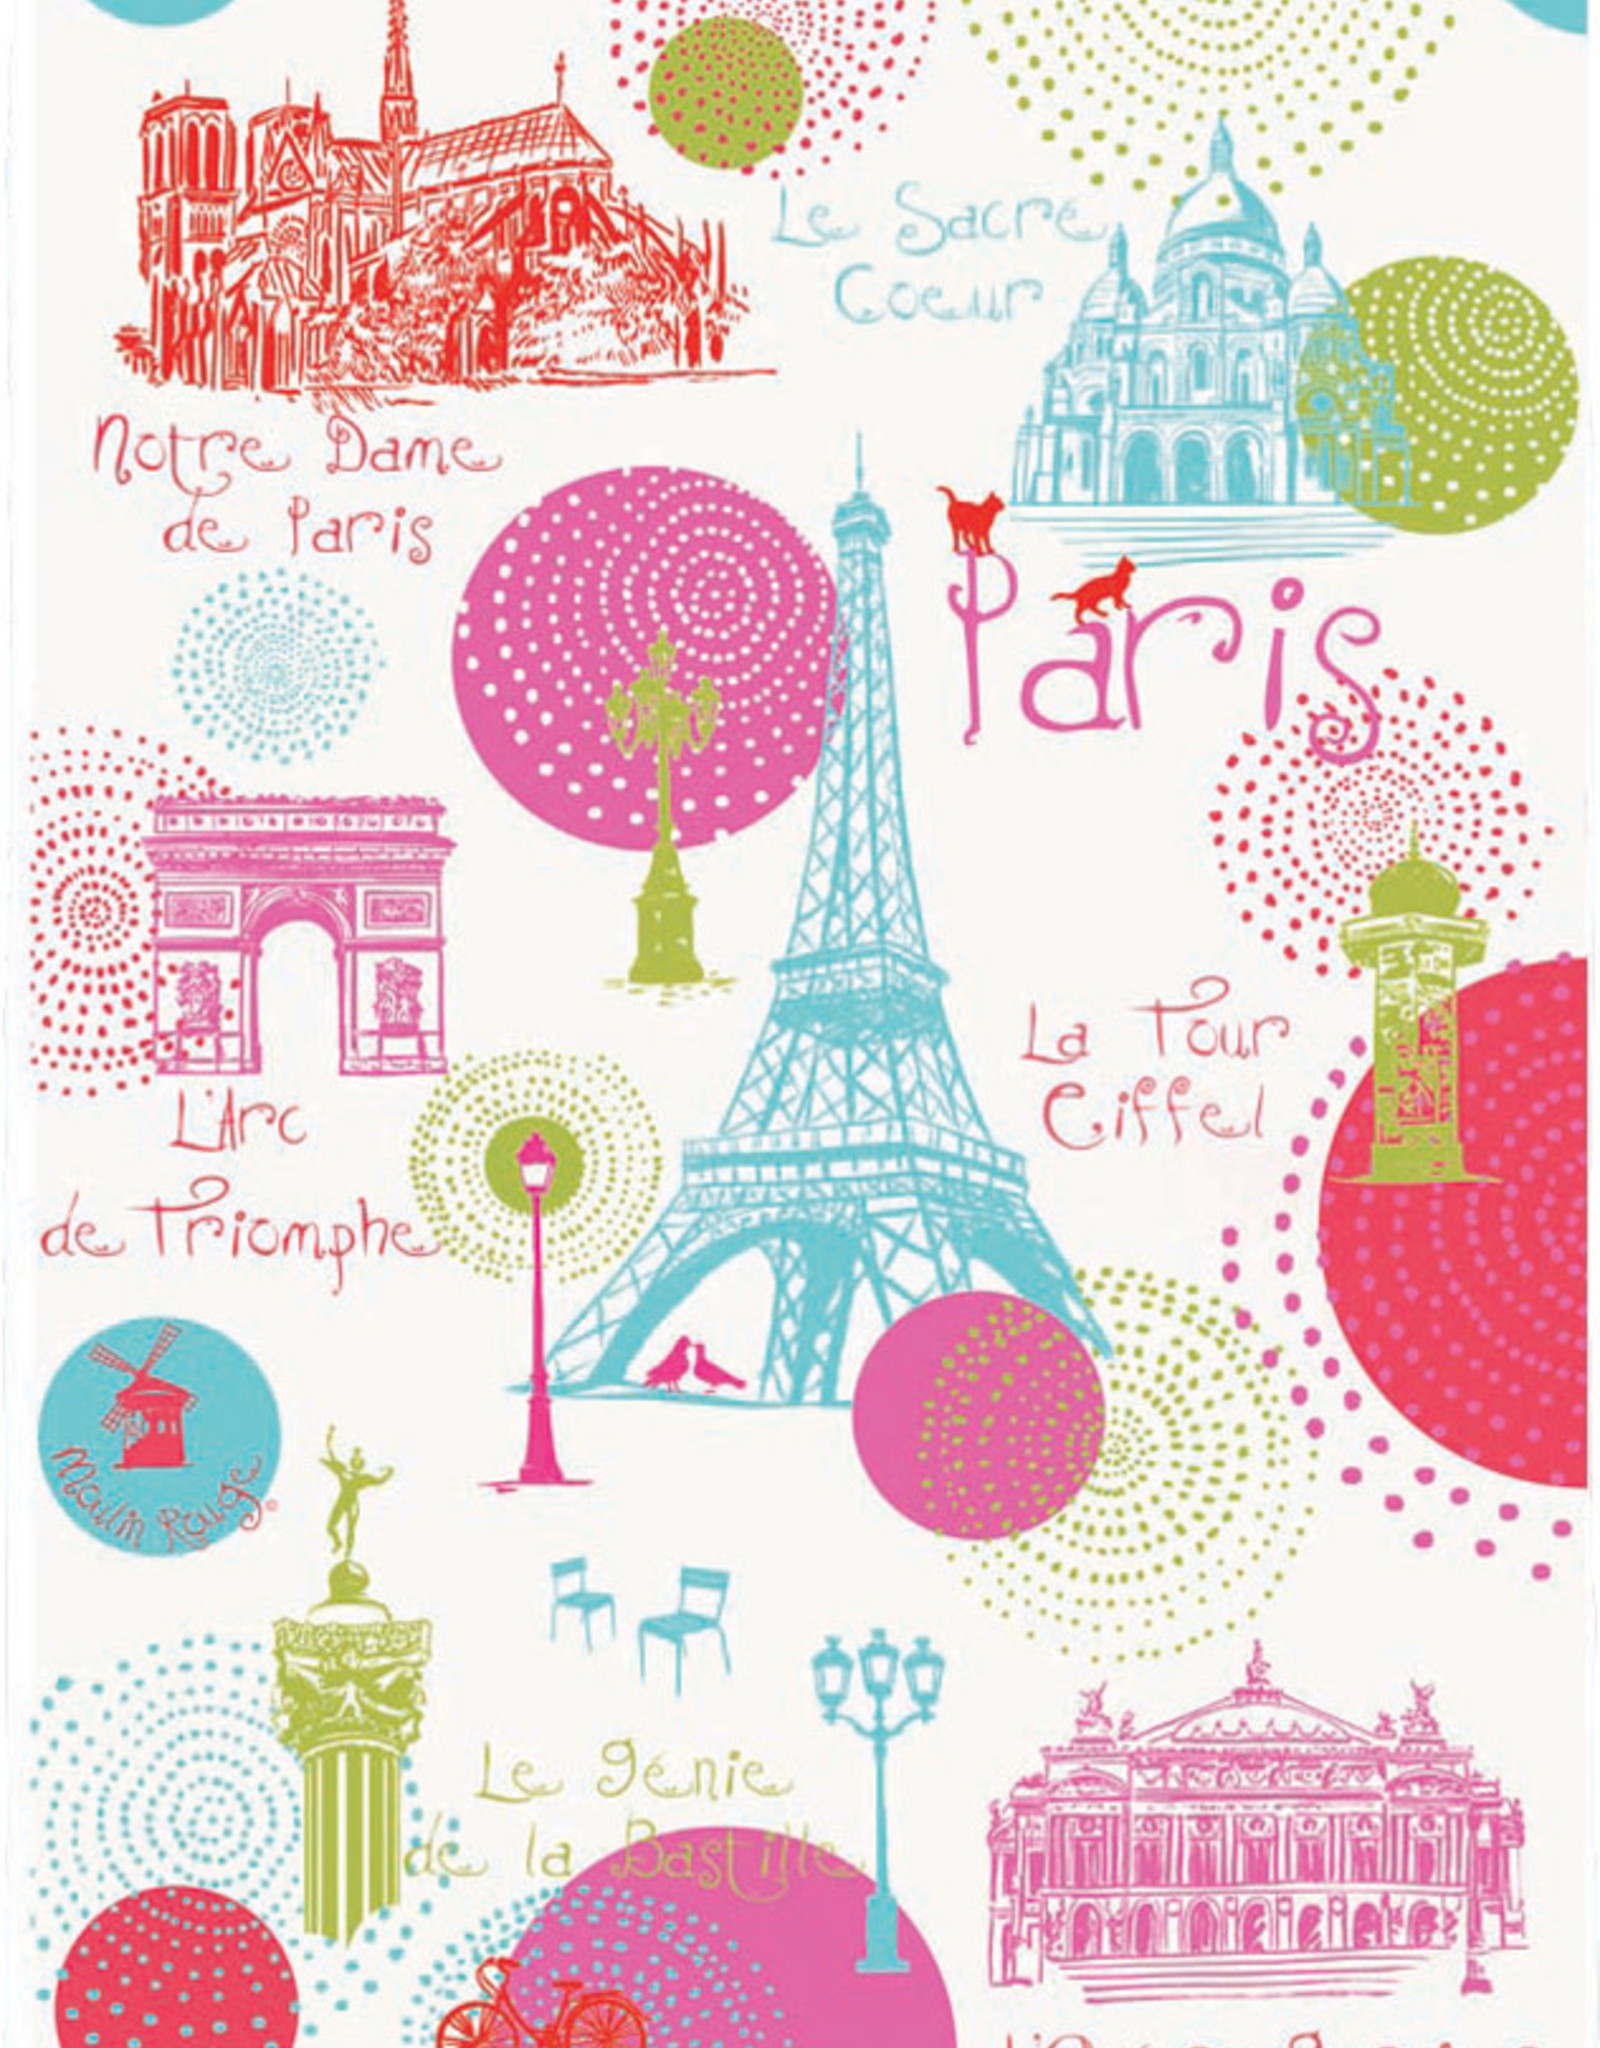 42F Paris Ronds Dish Towel